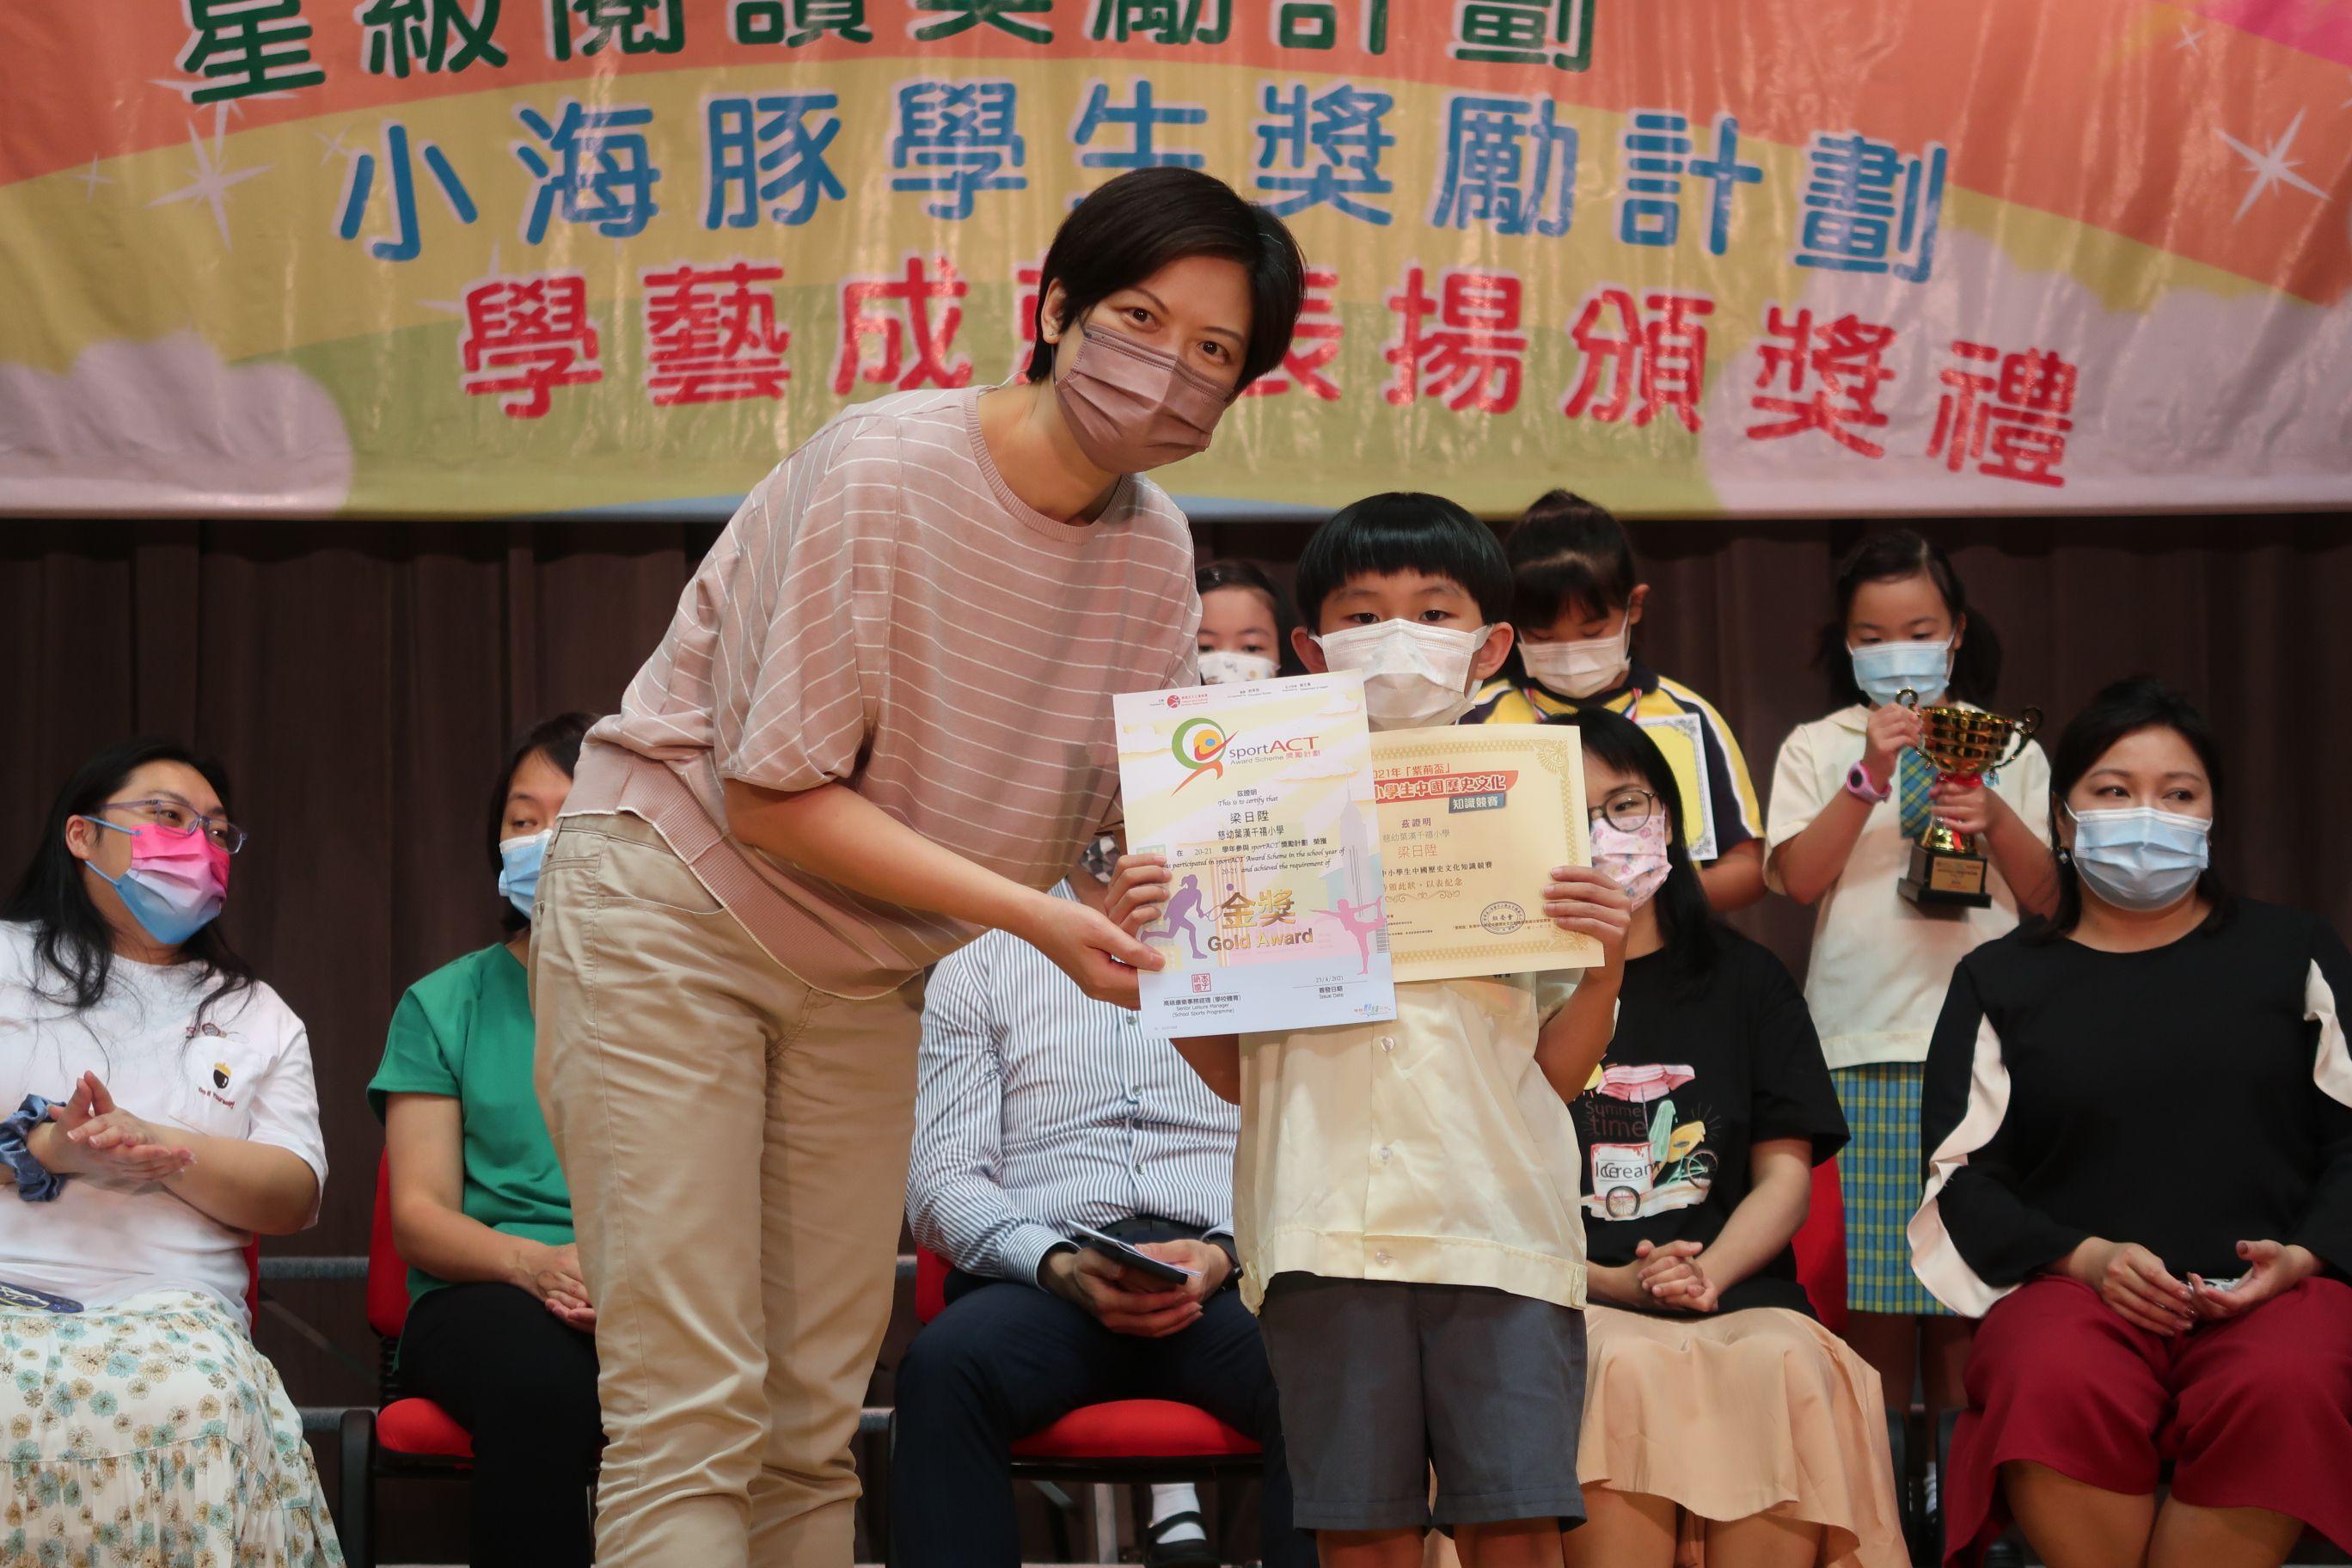 https://syh.edu.hk/sites/default/files/img_5922.jpg